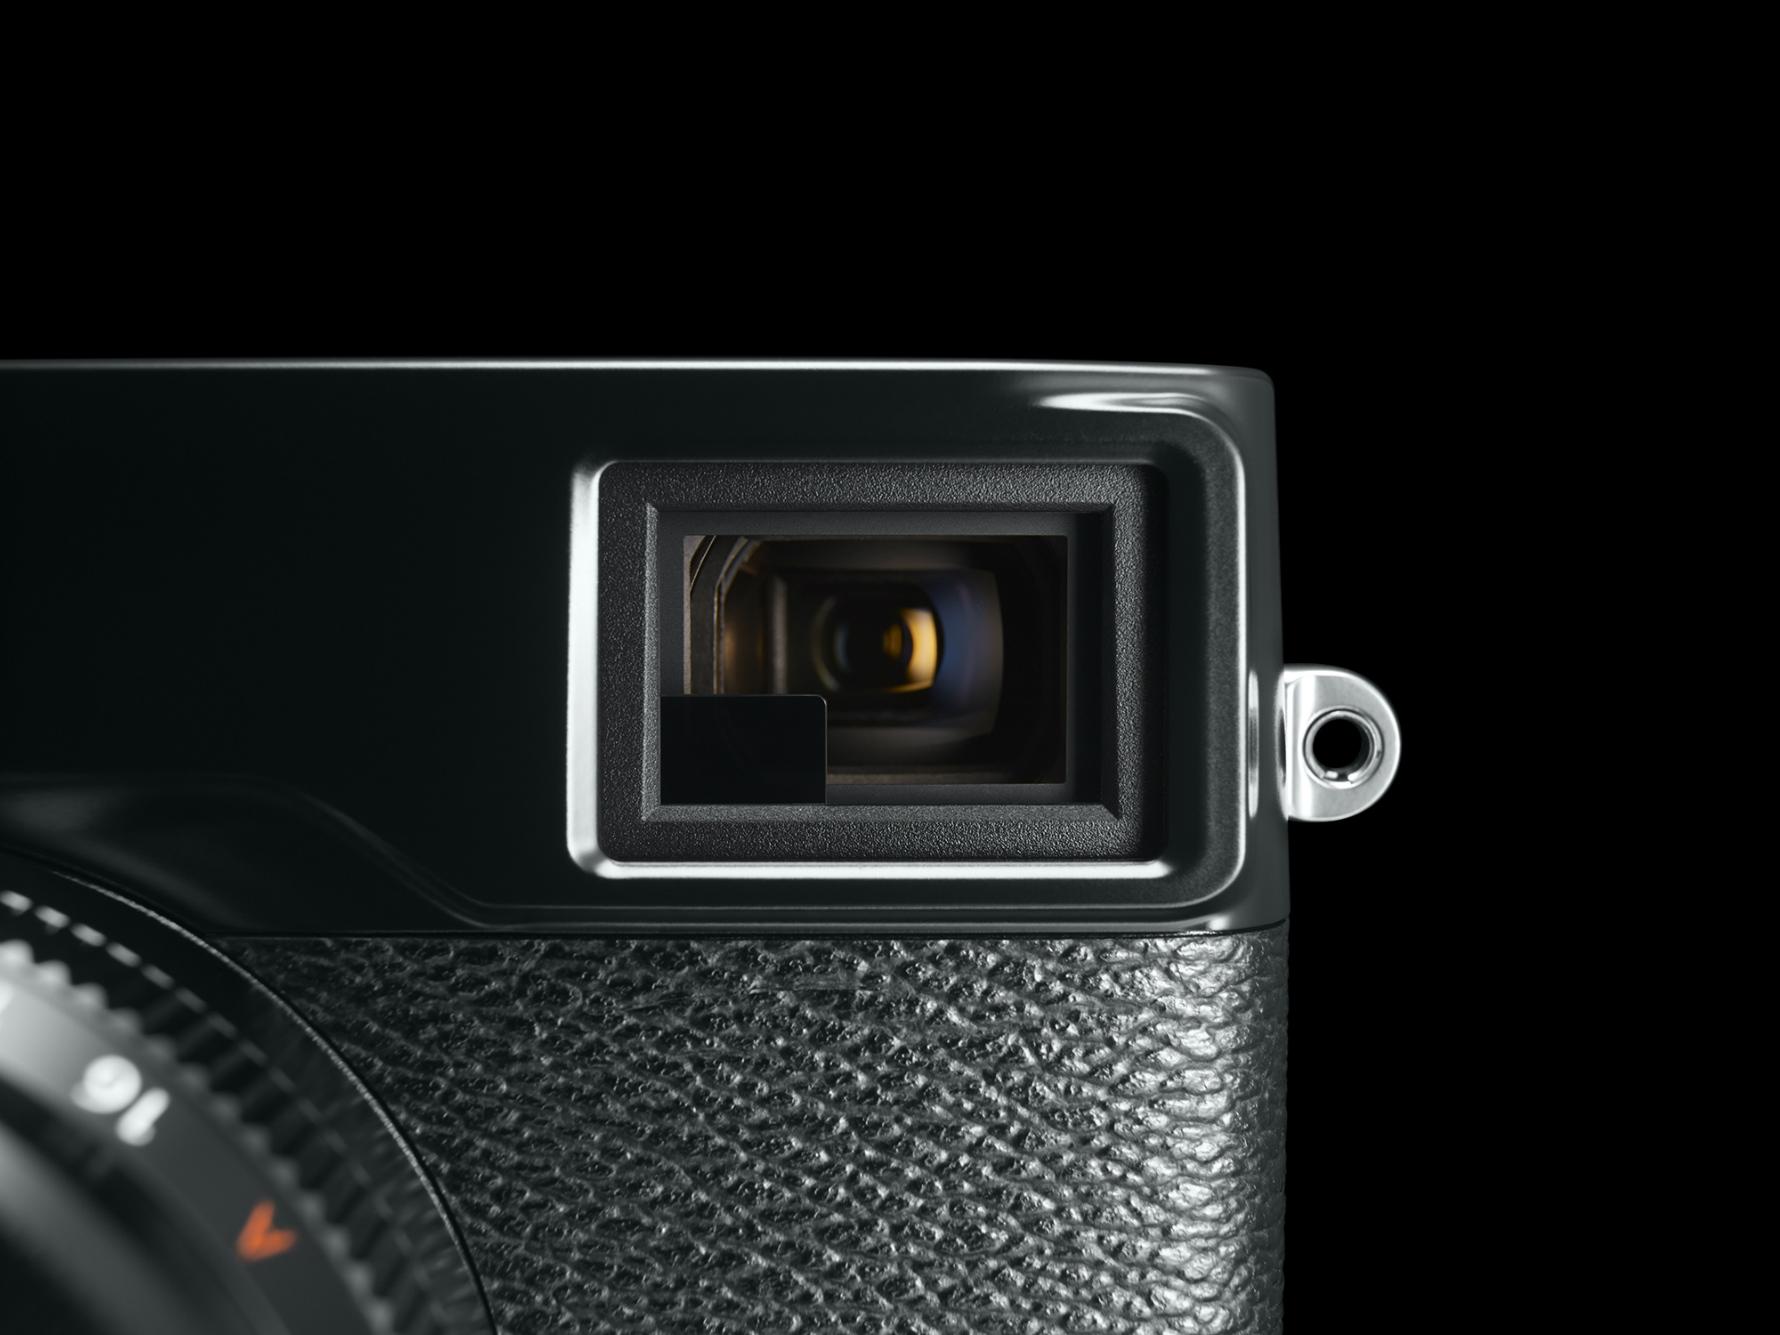 Fujifilm_X Pro2_BK_Finder_window r89